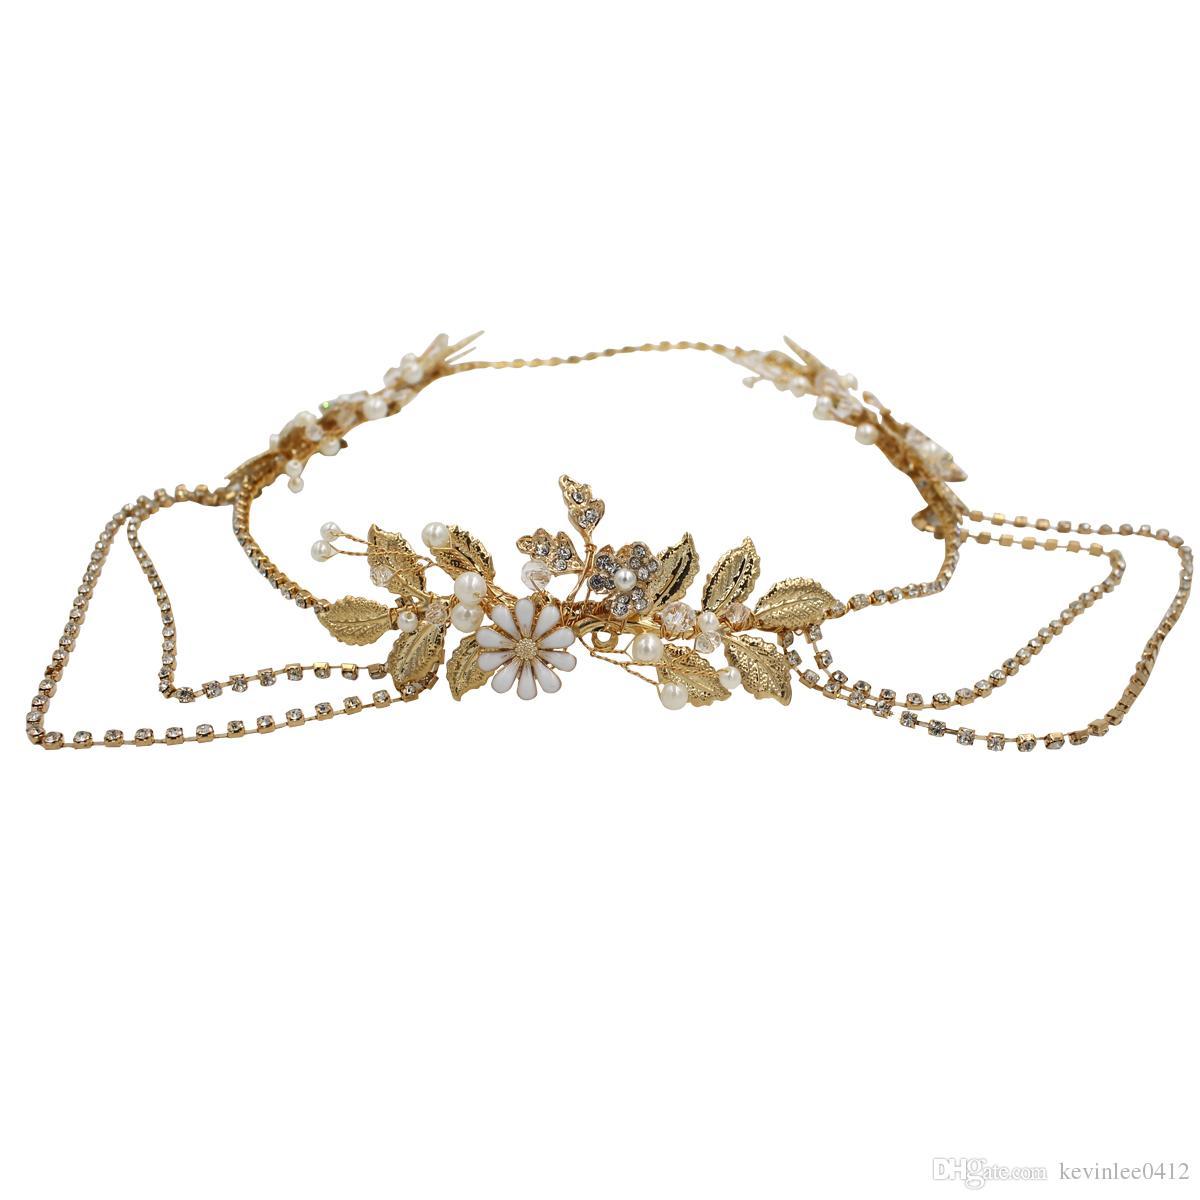 https://www.dhresource.com/0x0s/f2-albu-g8-M00-D0-A9-rBVaV10EhmyAMeKsAAVsCoJUdAc356.jpg/vintage-gold-rhinestone-flower-chain-headpiece-wedding-hair-accessories-special-occasion-headbands-bridal-tiara-crown-chinese-headband.jpg